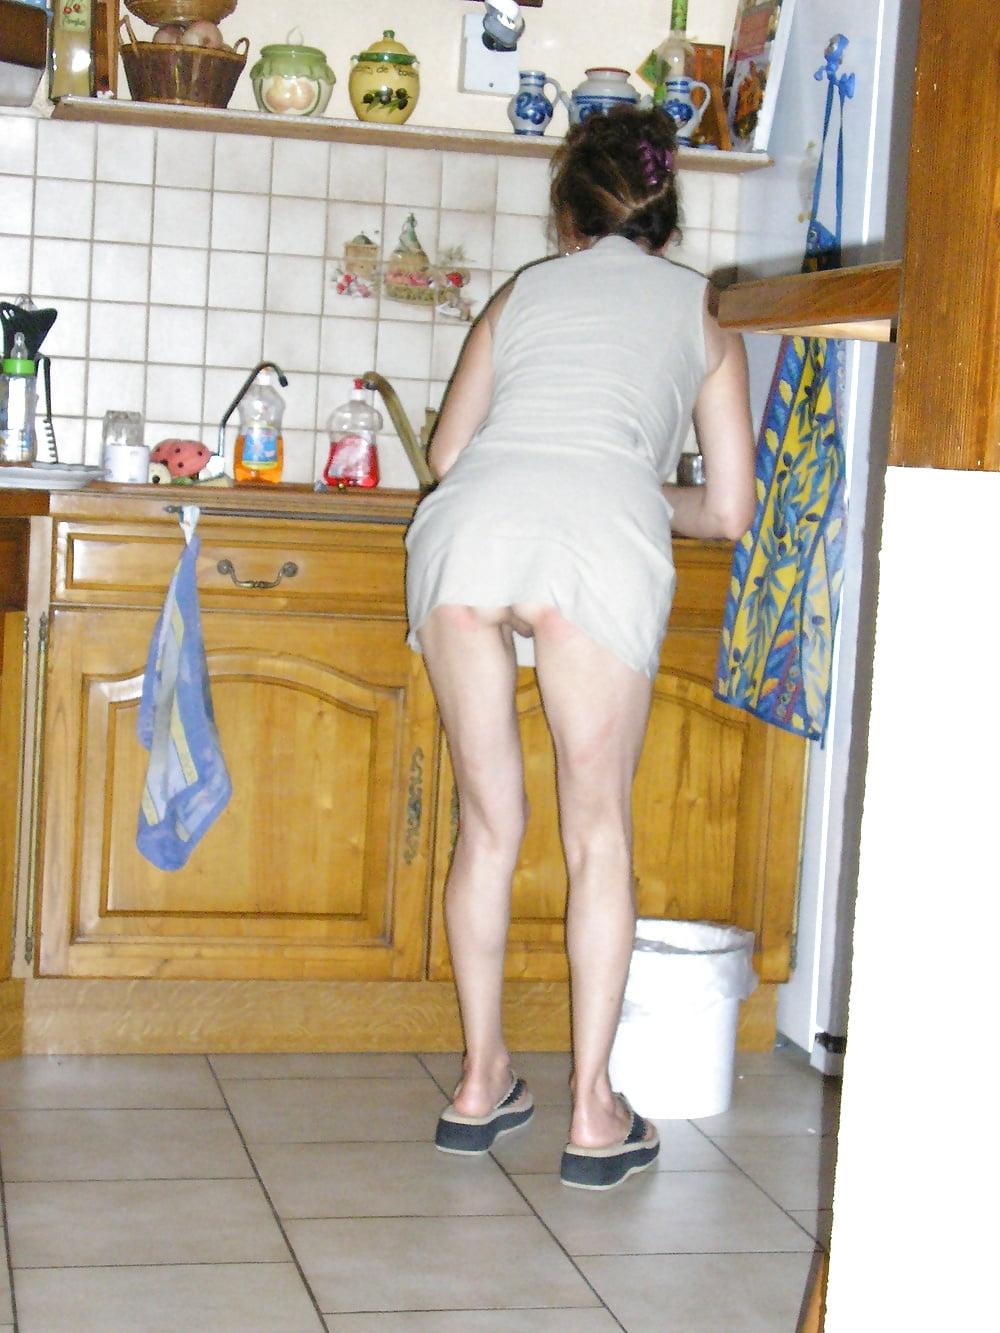 По дому без трусиков, видео порно на шубе